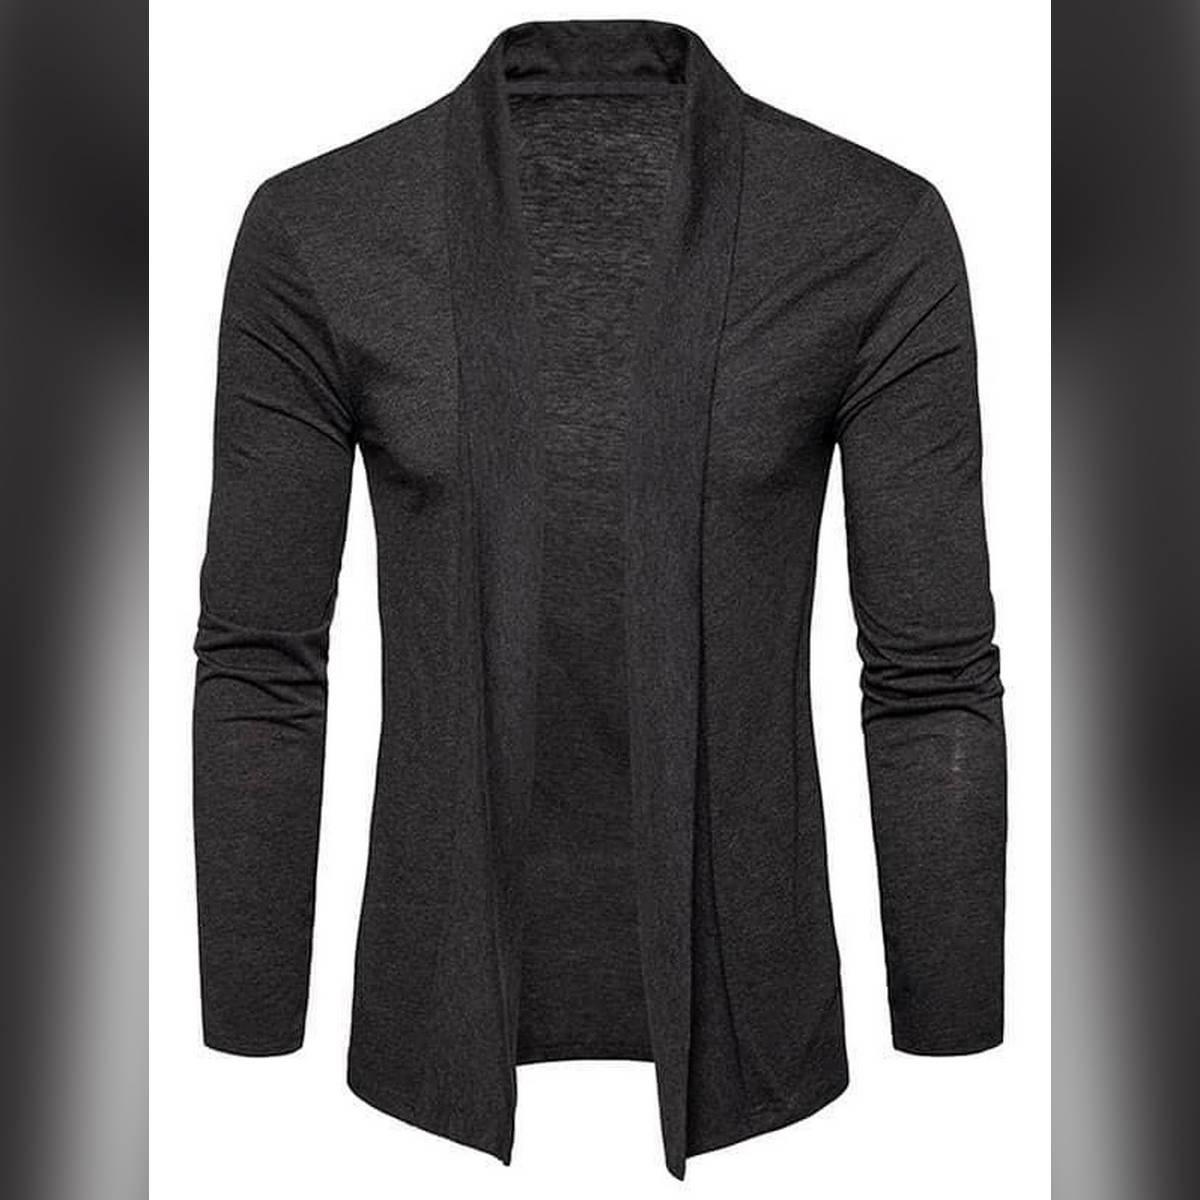 Oxygen Clothing Black Cardigan for Men